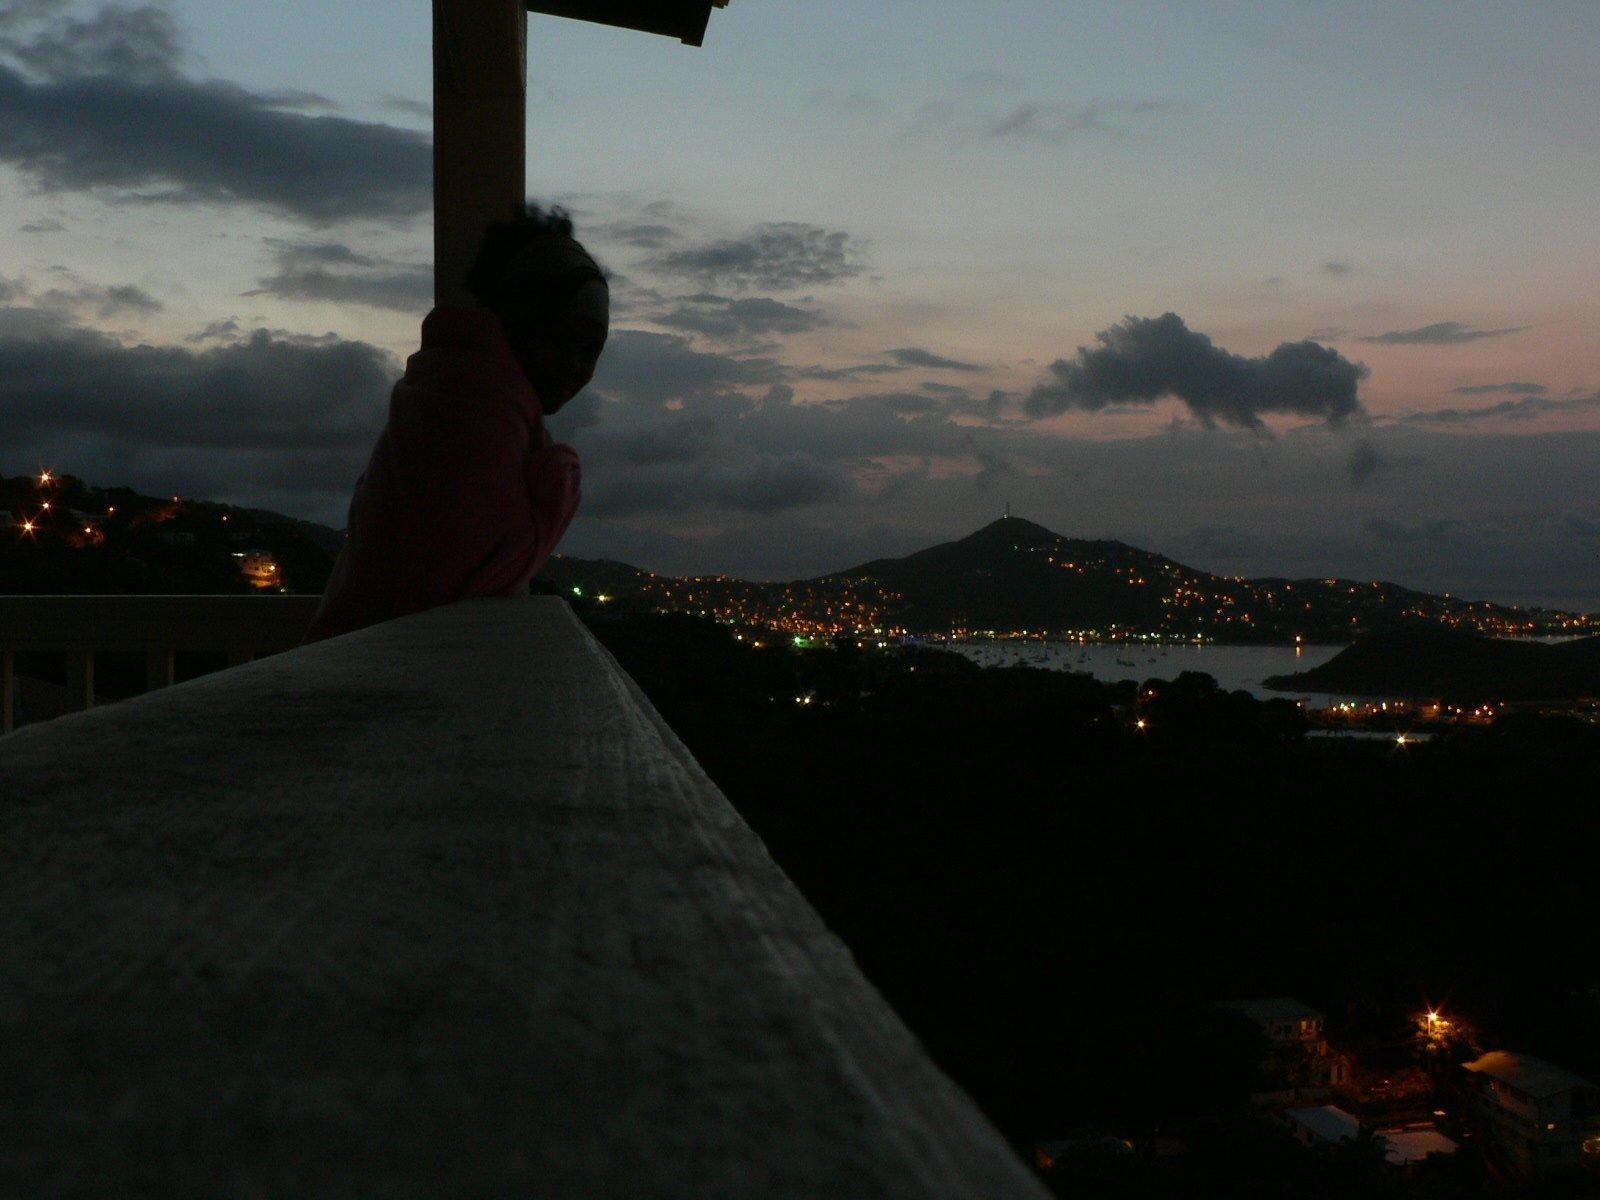 The Virgin Islands, My Hair, and the Bump!